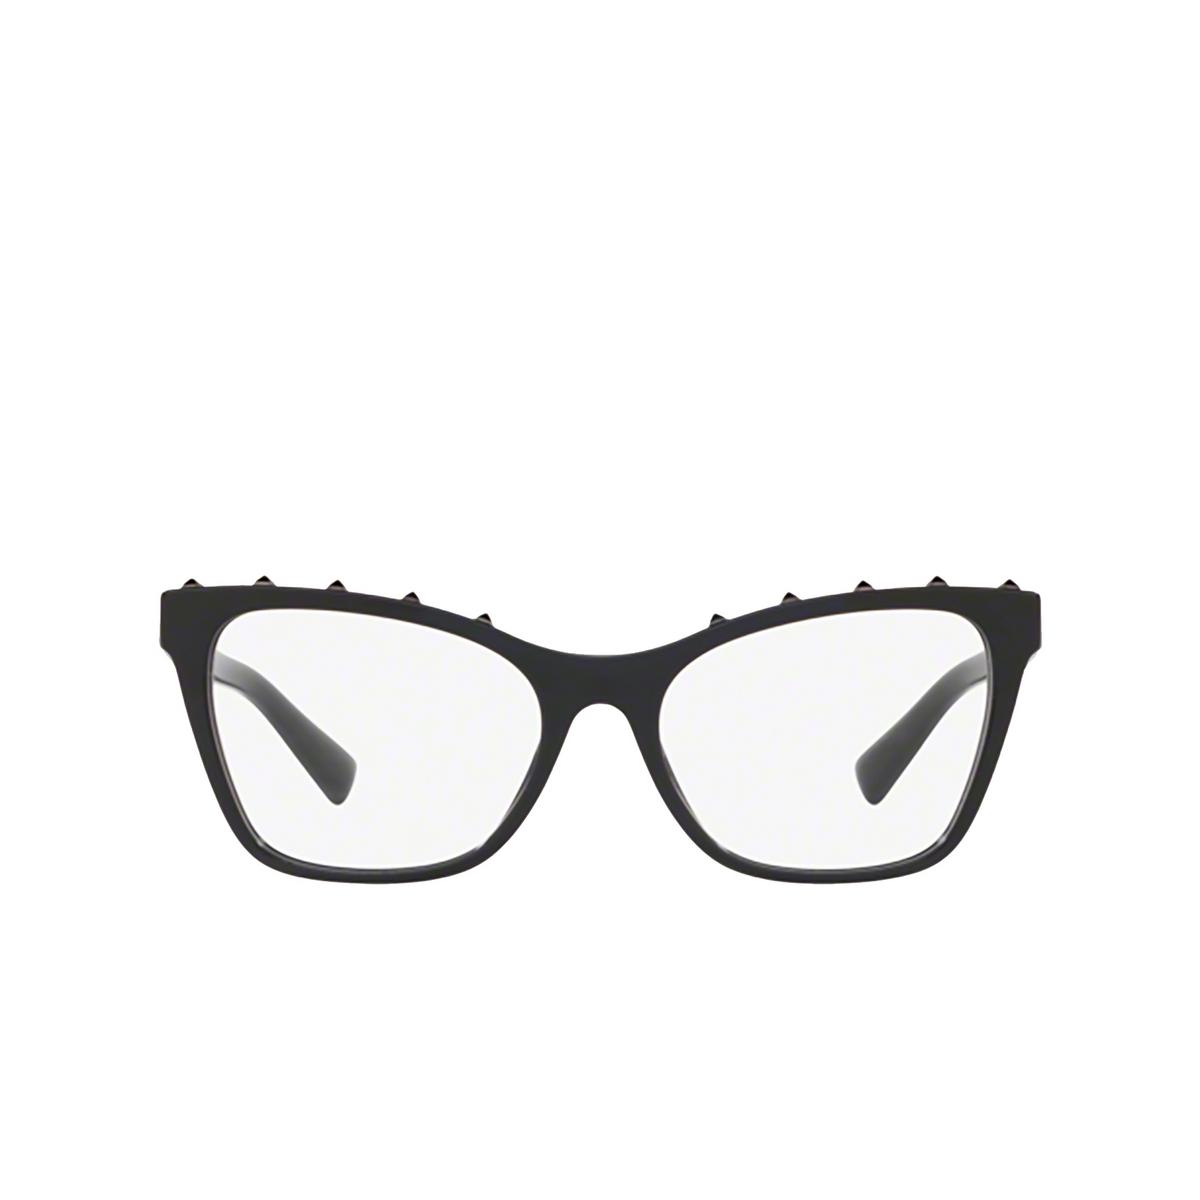 Valentino® Square Eyeglasses: VA3039 color Black 5001 - front view.